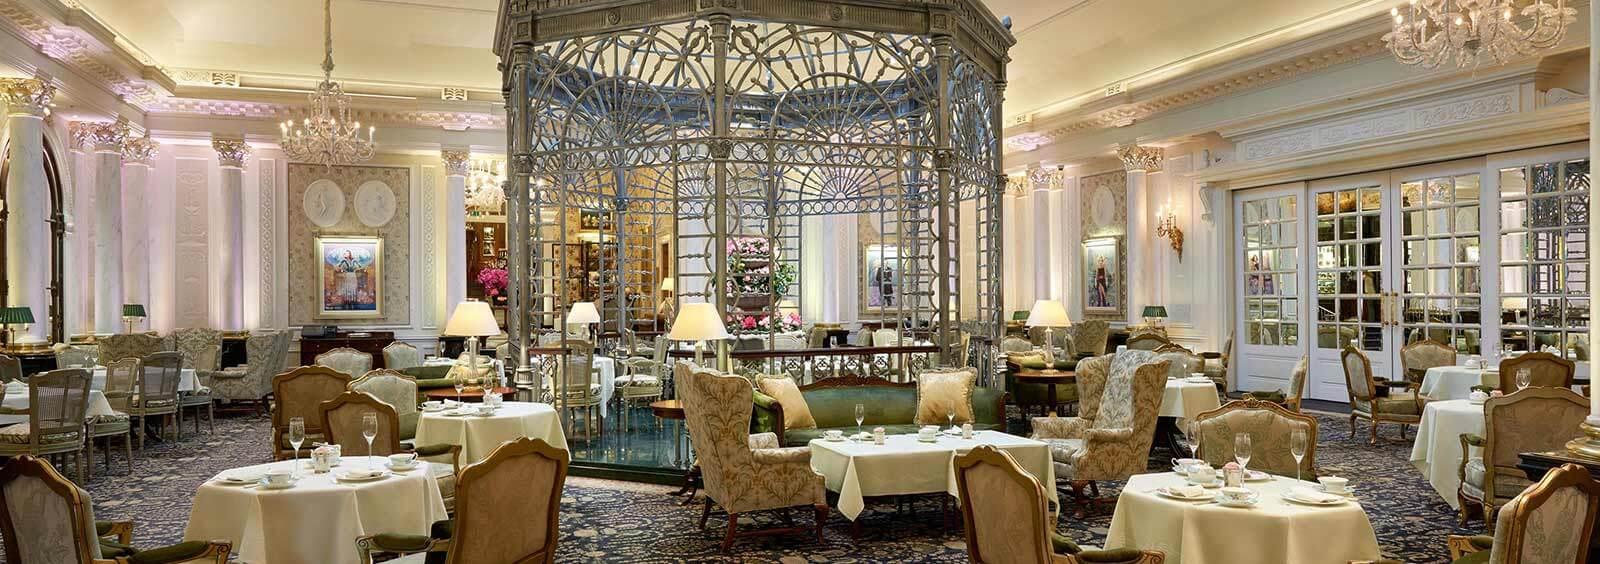 The Savoy, London restaurant